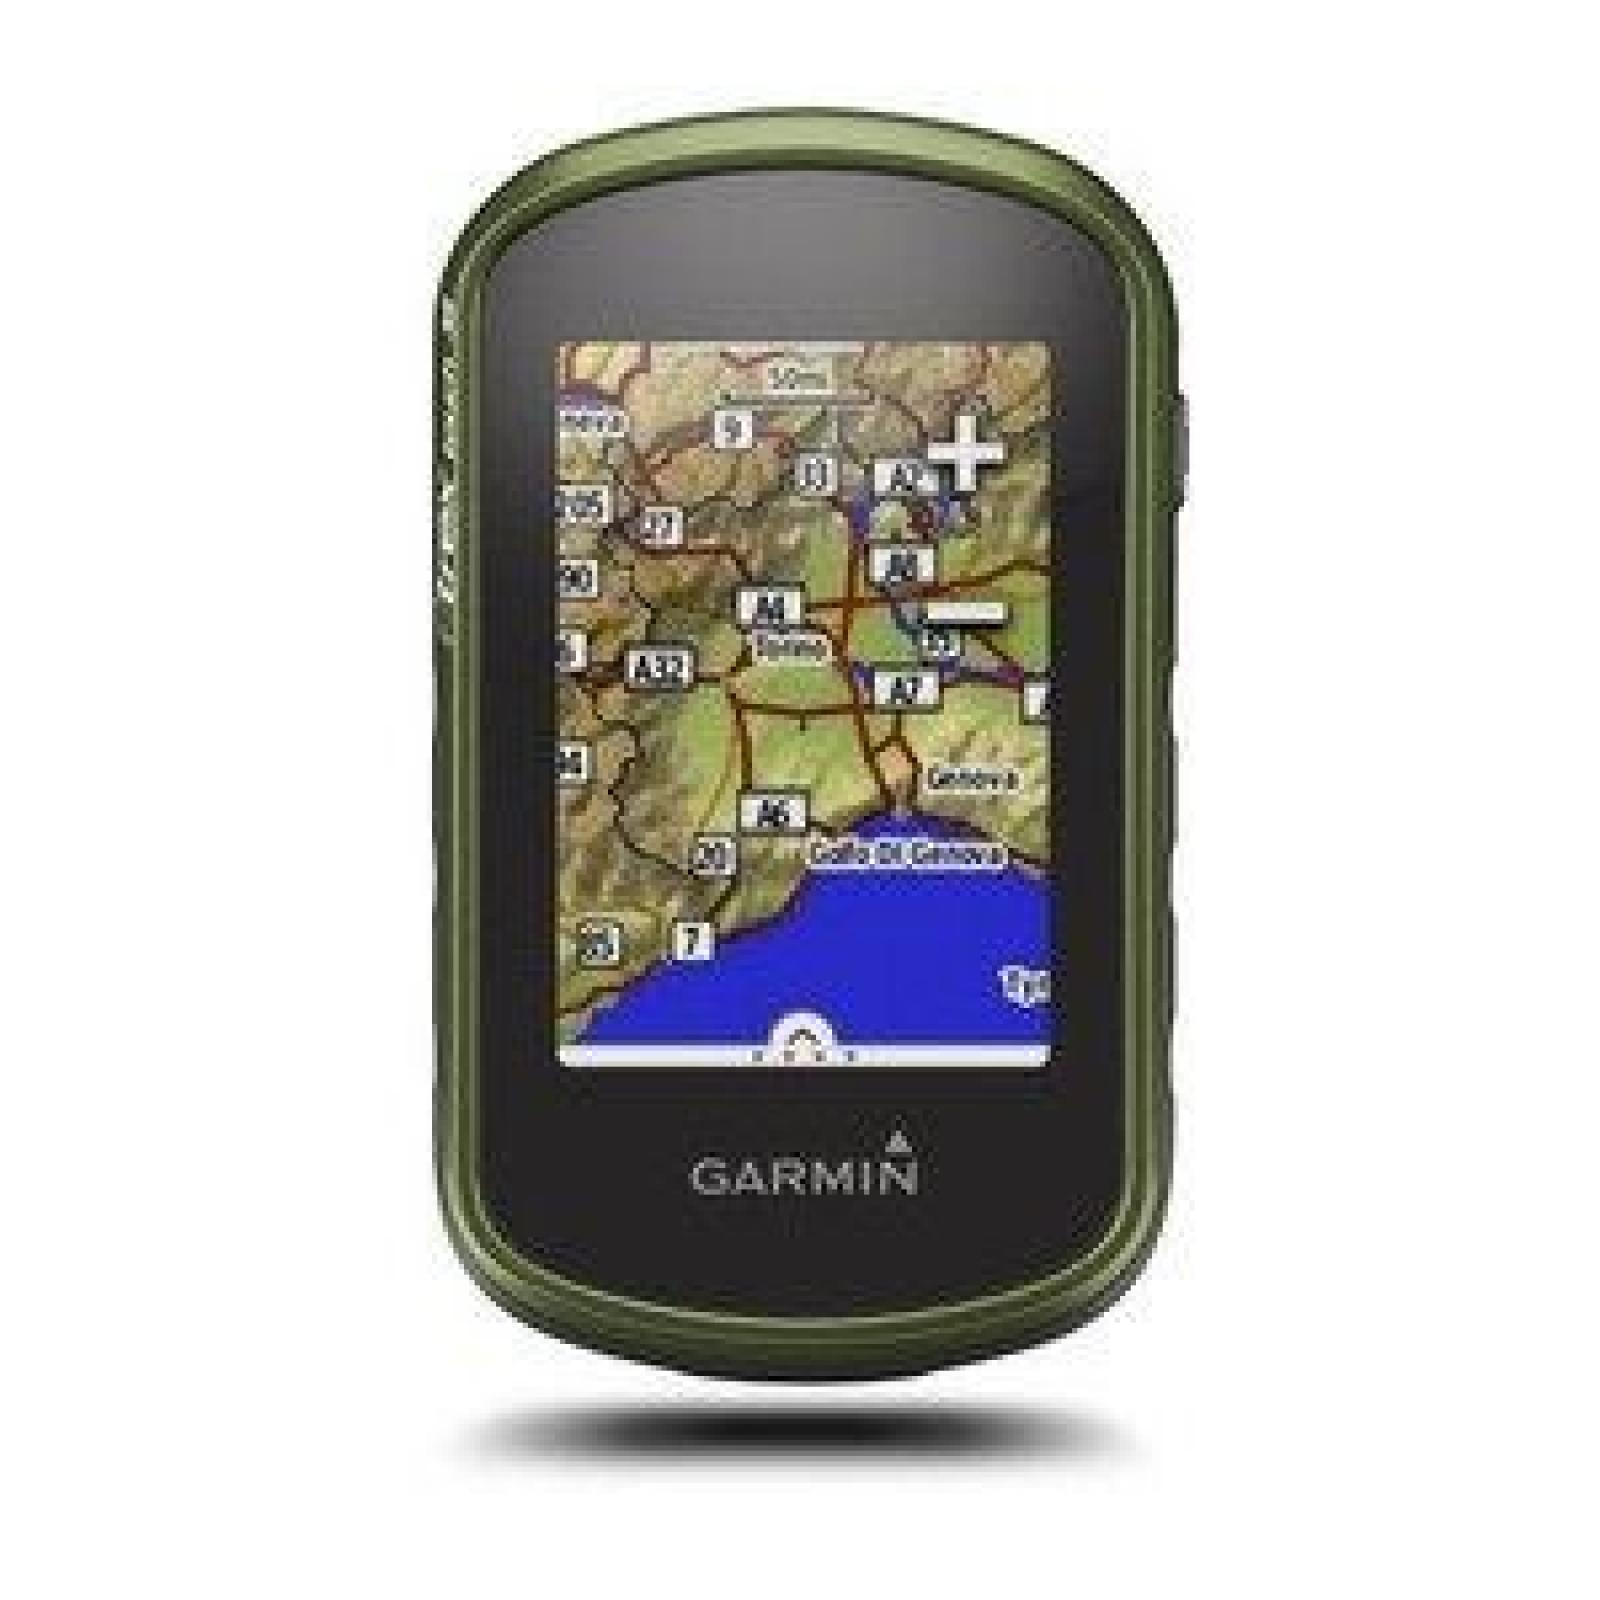 https://www.badec.store/produkty_img/garmin-etrex-touch-35-europe461603010450L.jpg